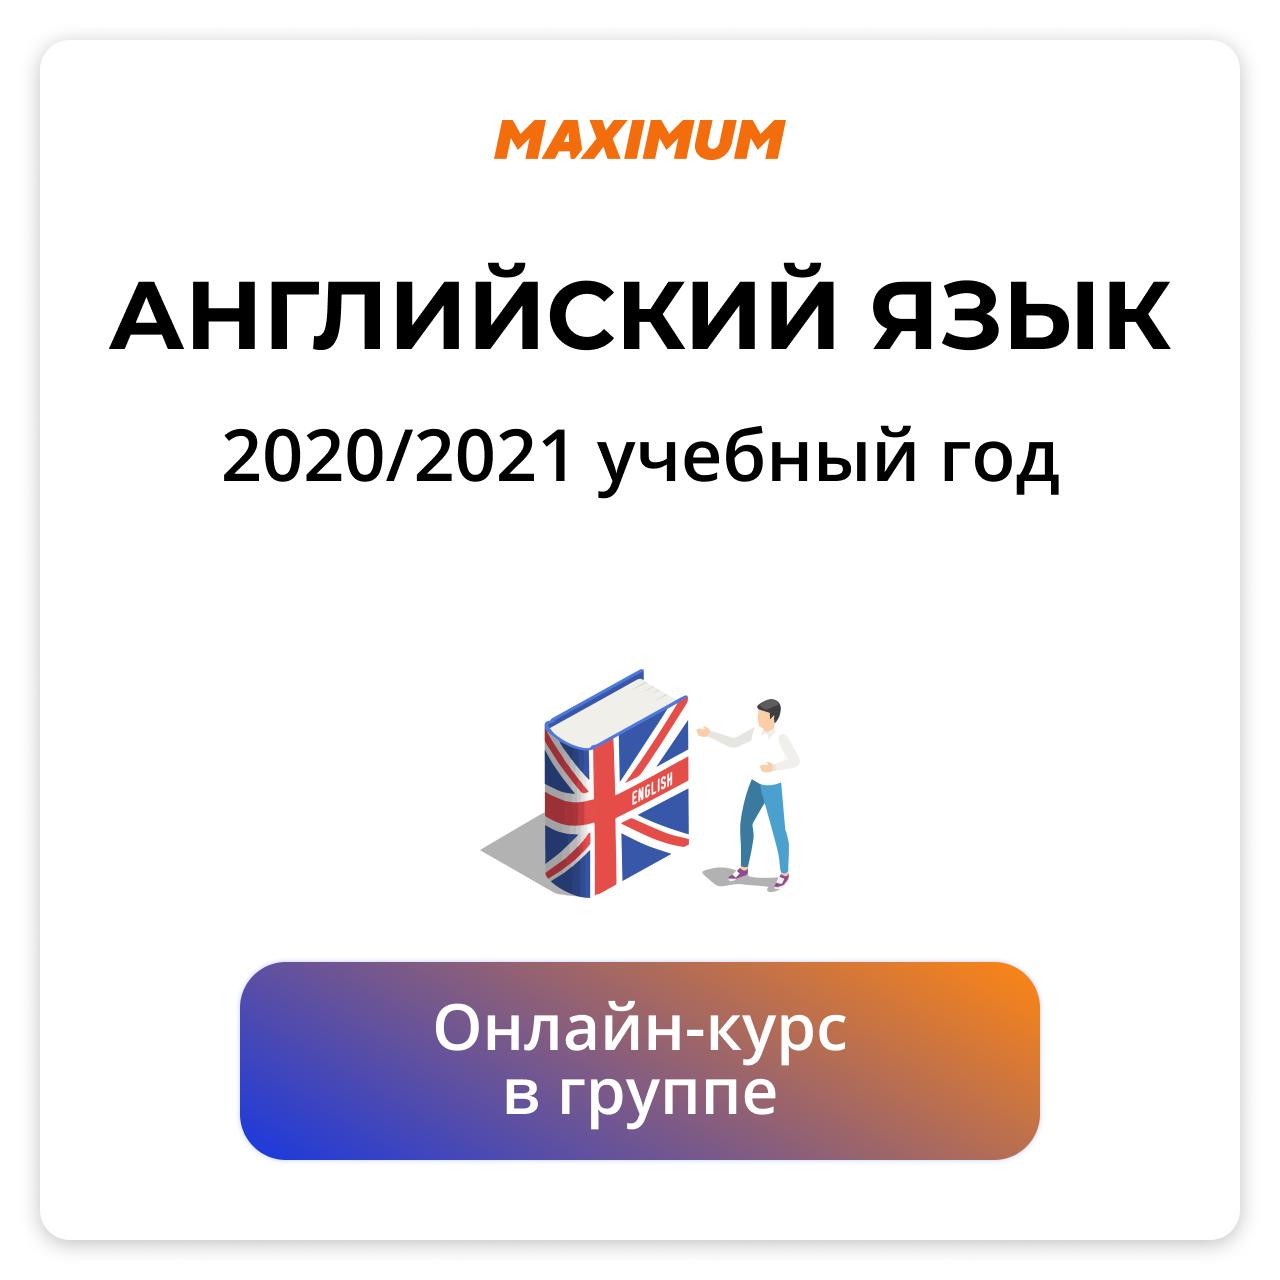 Английский язык ОГЭ Онлайн-группа